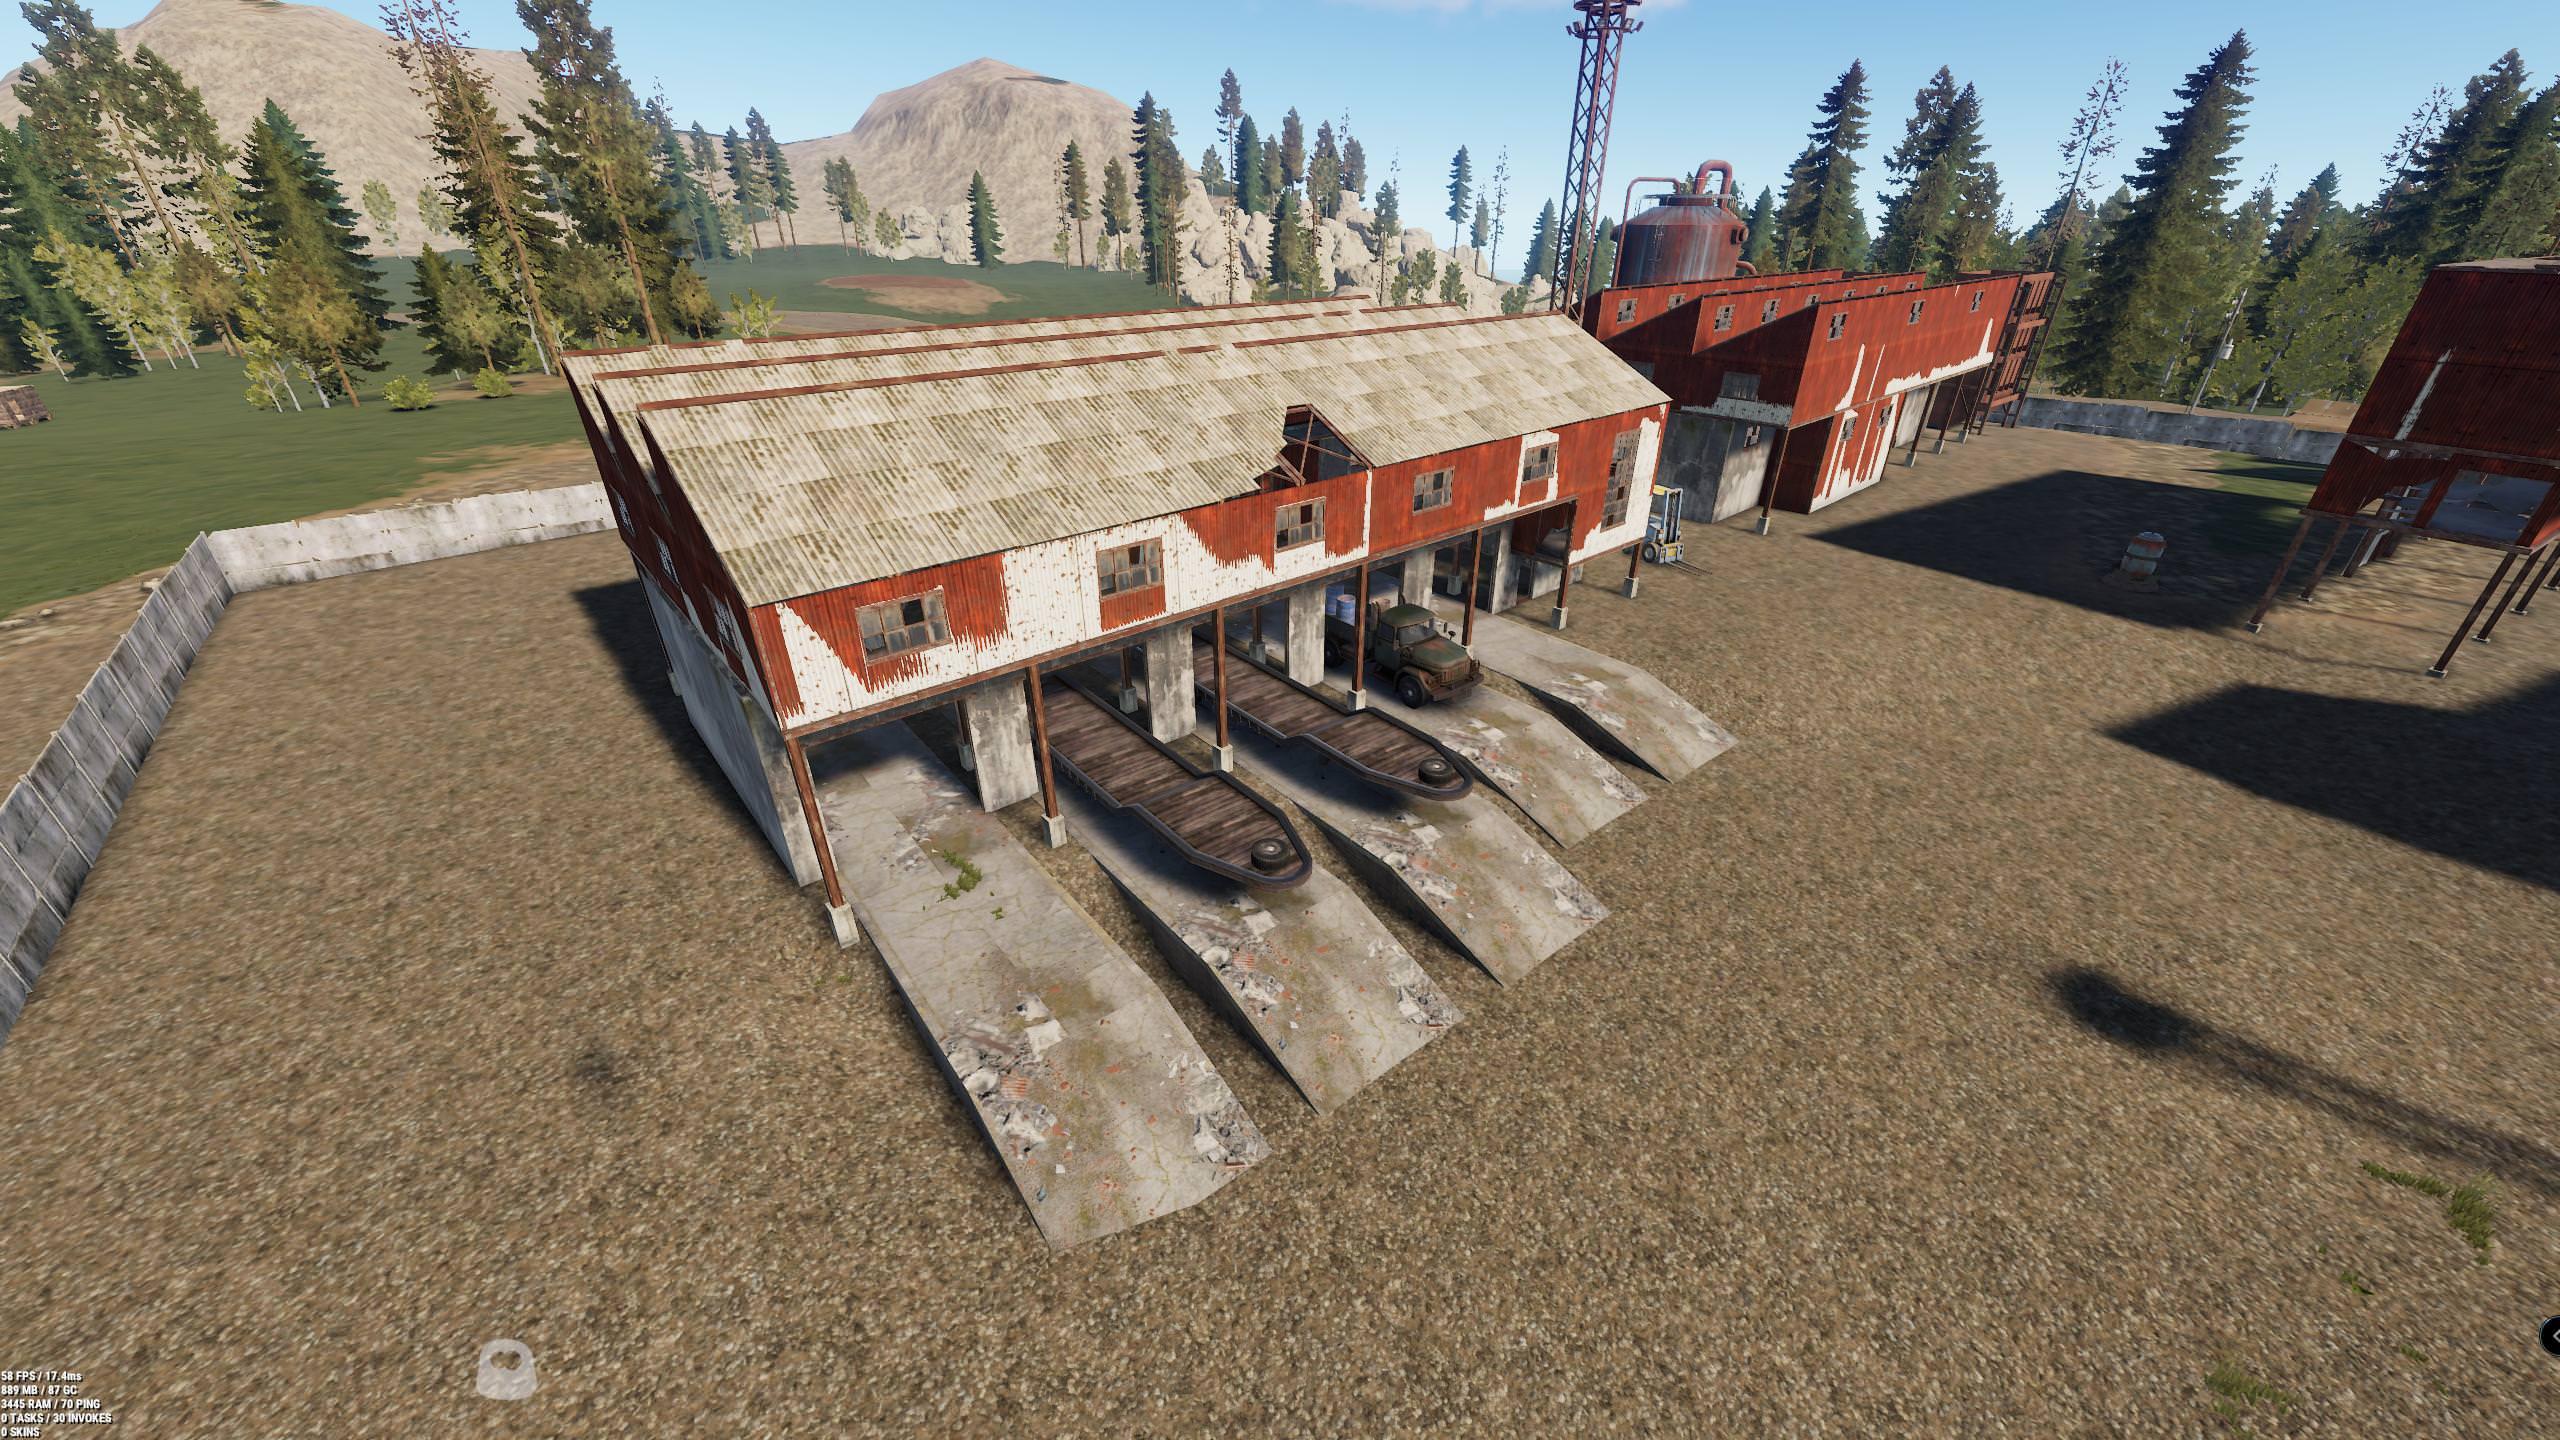 Rust - Rust 2K